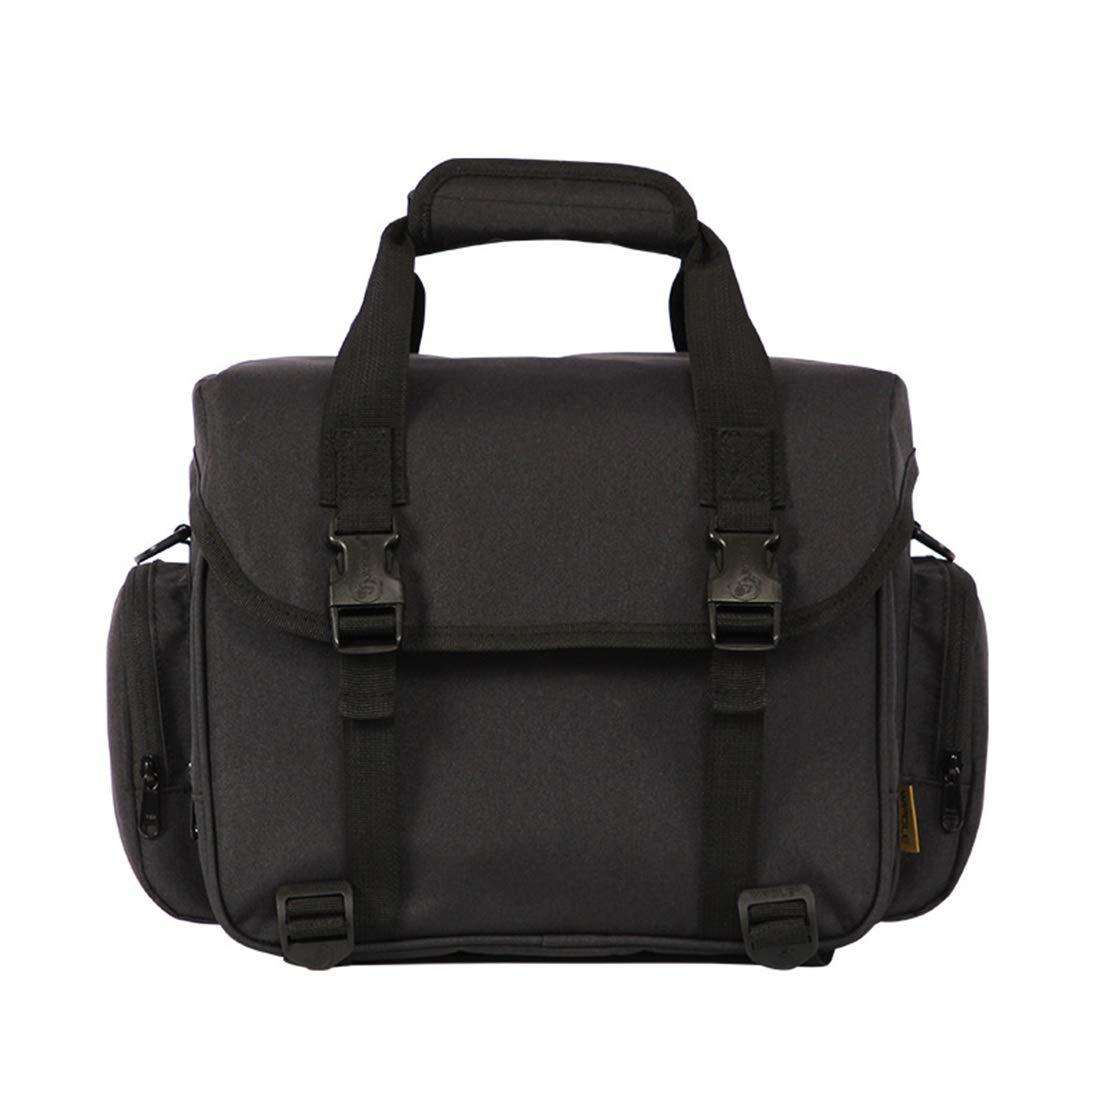 JOYS CLOTHING 多機能防水大容量一眼レフカメラバッグショルダーデジタル盗難防止バッグ (Color : ブラック)  ブラック B07L27V12T